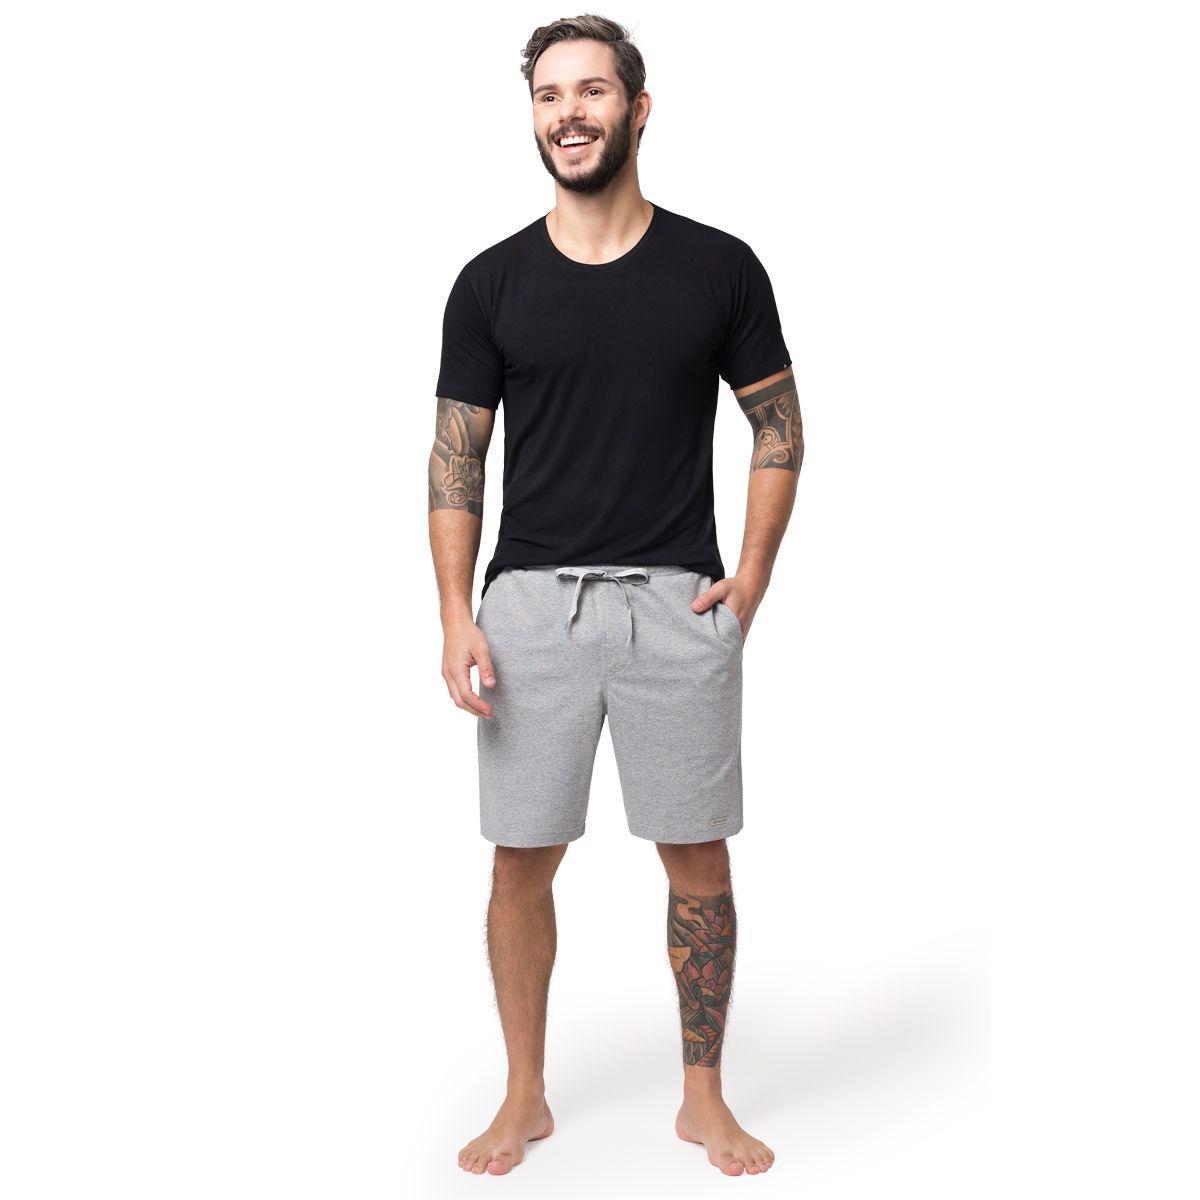 Bermuda Masculina Homewear Moletinho Mescla 05.02.023